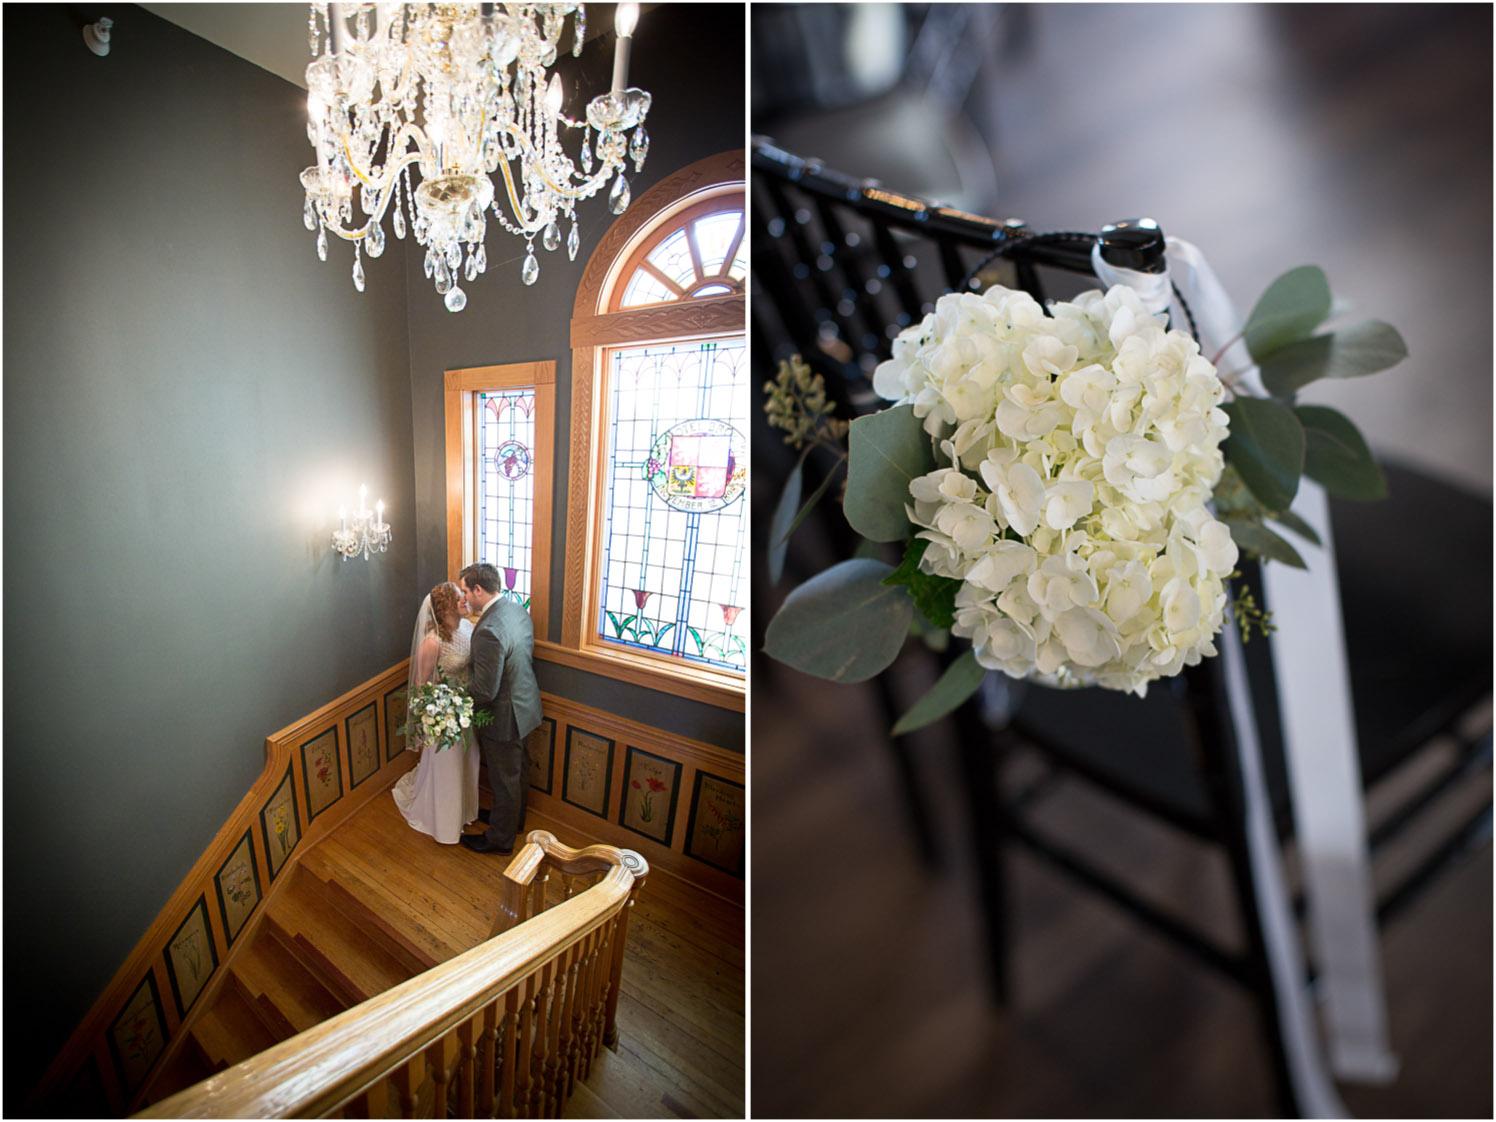 08-winter-brunch-morning-weddings-at-the-broz-new-prage-mn-minnesota-bride-groom-portraits-mahonen-photography.jpg